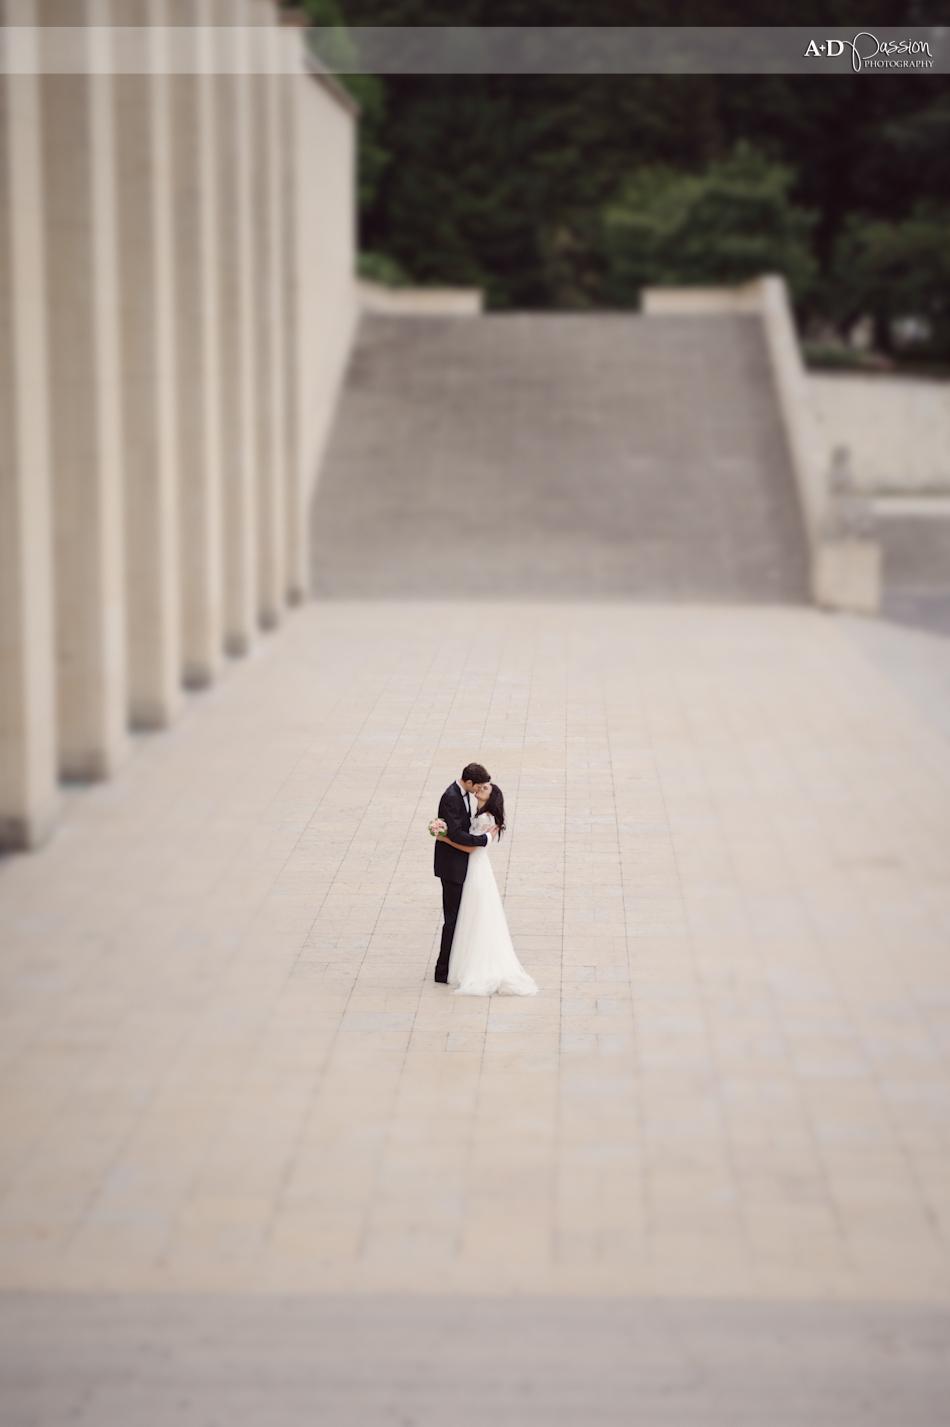 AD Passion Photography | 20120902_ad-passion_fotograf-profesionist-de-nunta_Andreea&Adi_AfterWedding-TrashTheDress_Paris_0055 | Adelin, Dida, fotograf profesionist, fotograf de nunta, fotografie de nunta, fotograf Timisoara, fotograf Craiova, fotograf Bucuresti, fotograf Arad, nunta Timisoara, nunta Arad, nunta Bucuresti, nunta Craiova